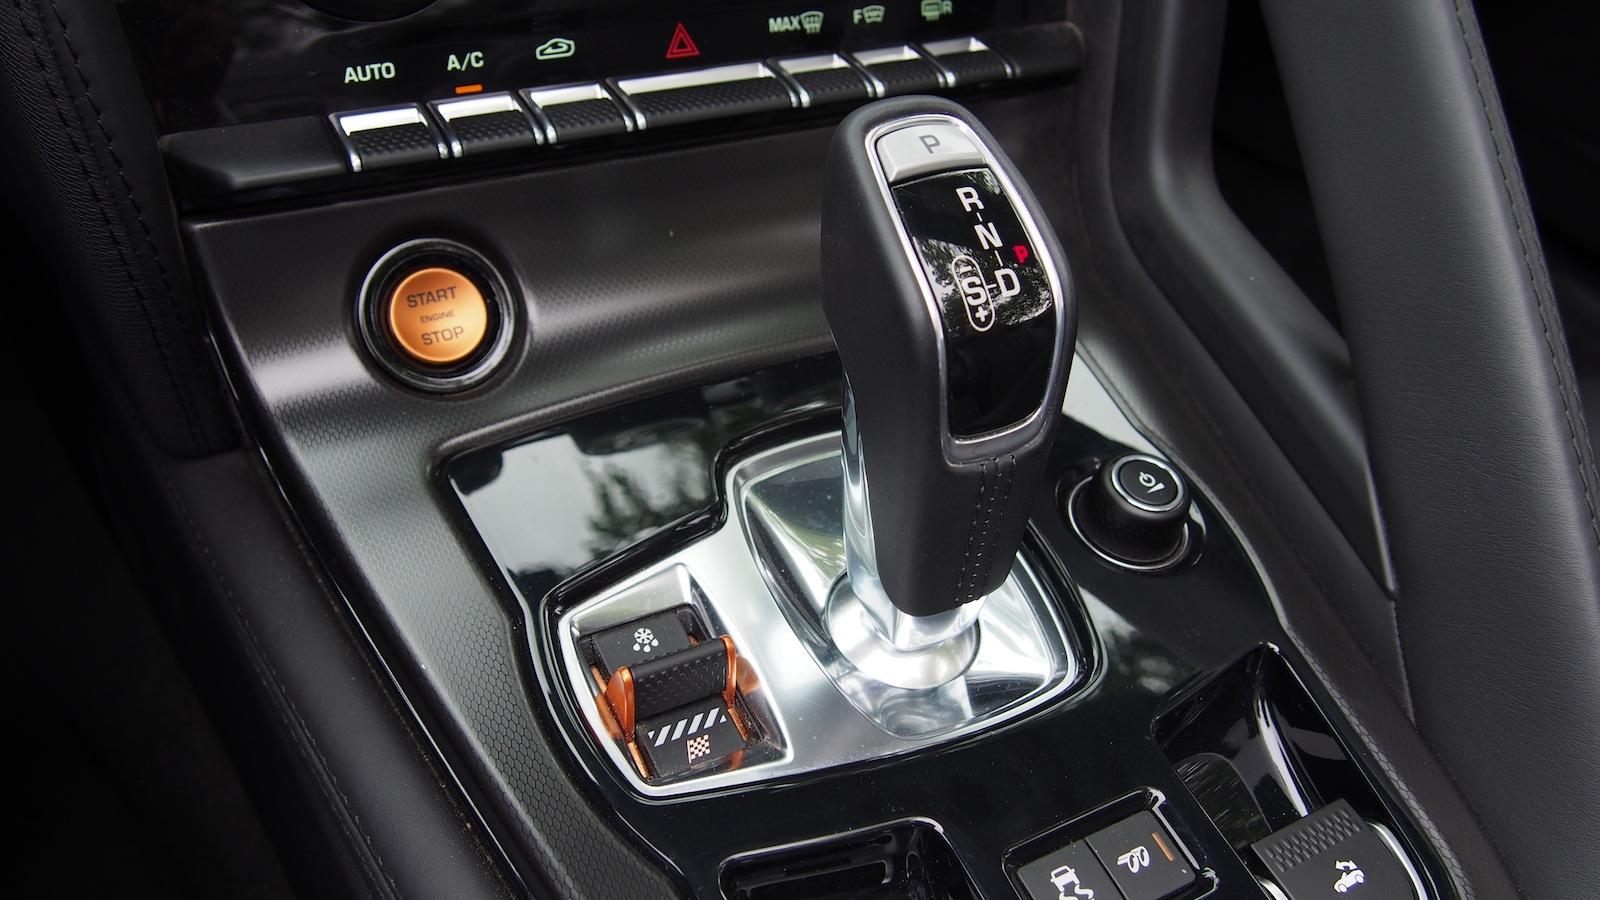 Review Jaguar FType V S Convertible Canadian Auto Review - 2015 jaguar f type v8 s